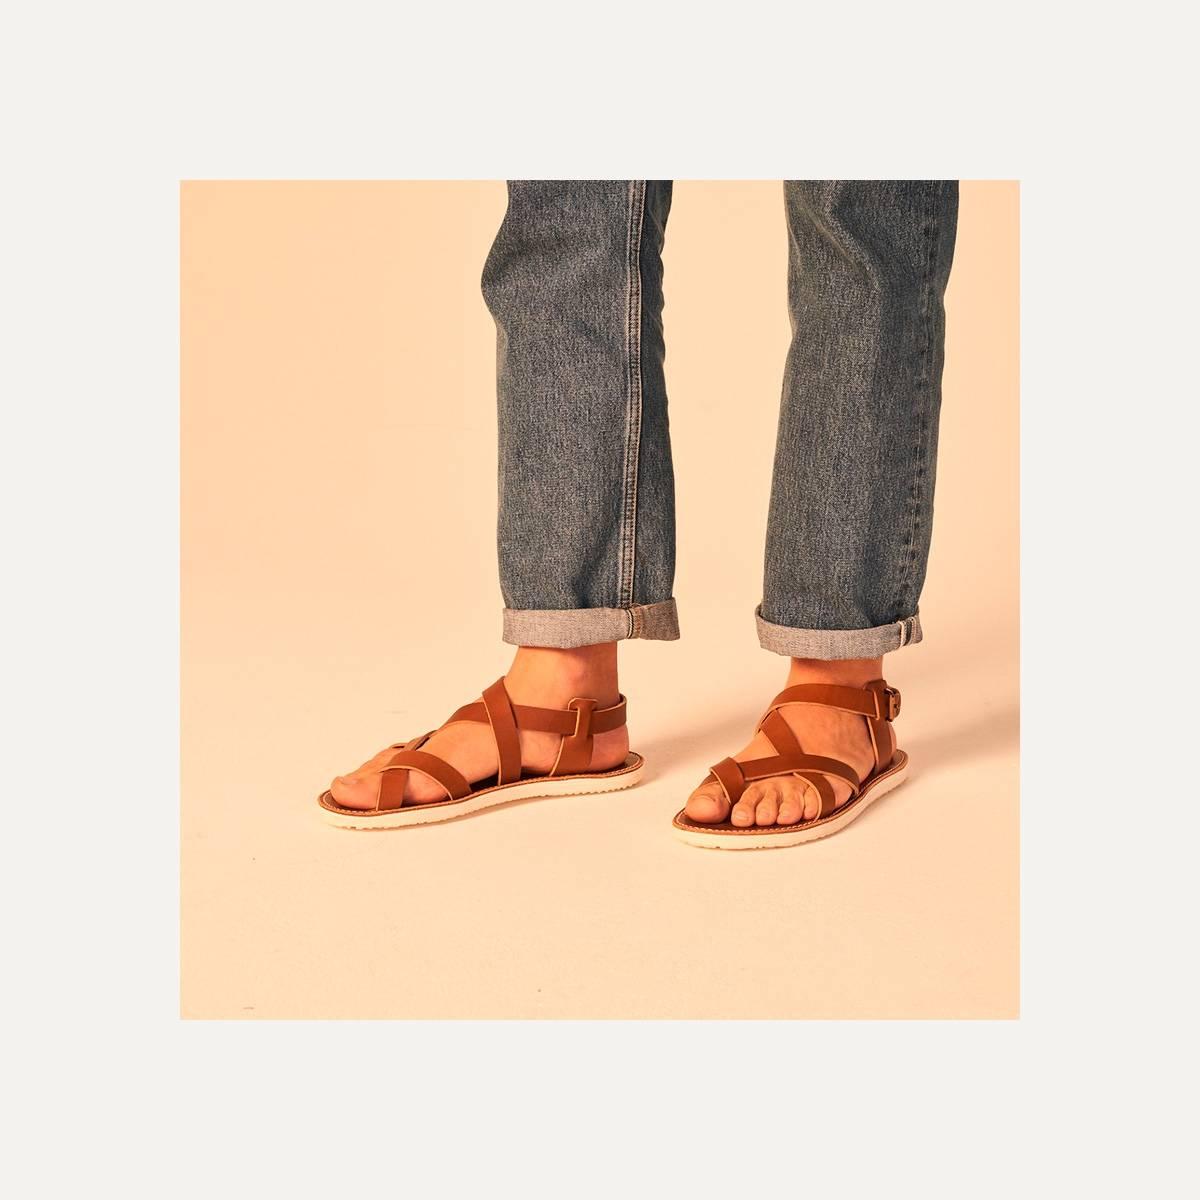 Lhassa leather sandals - Black (image n°9)